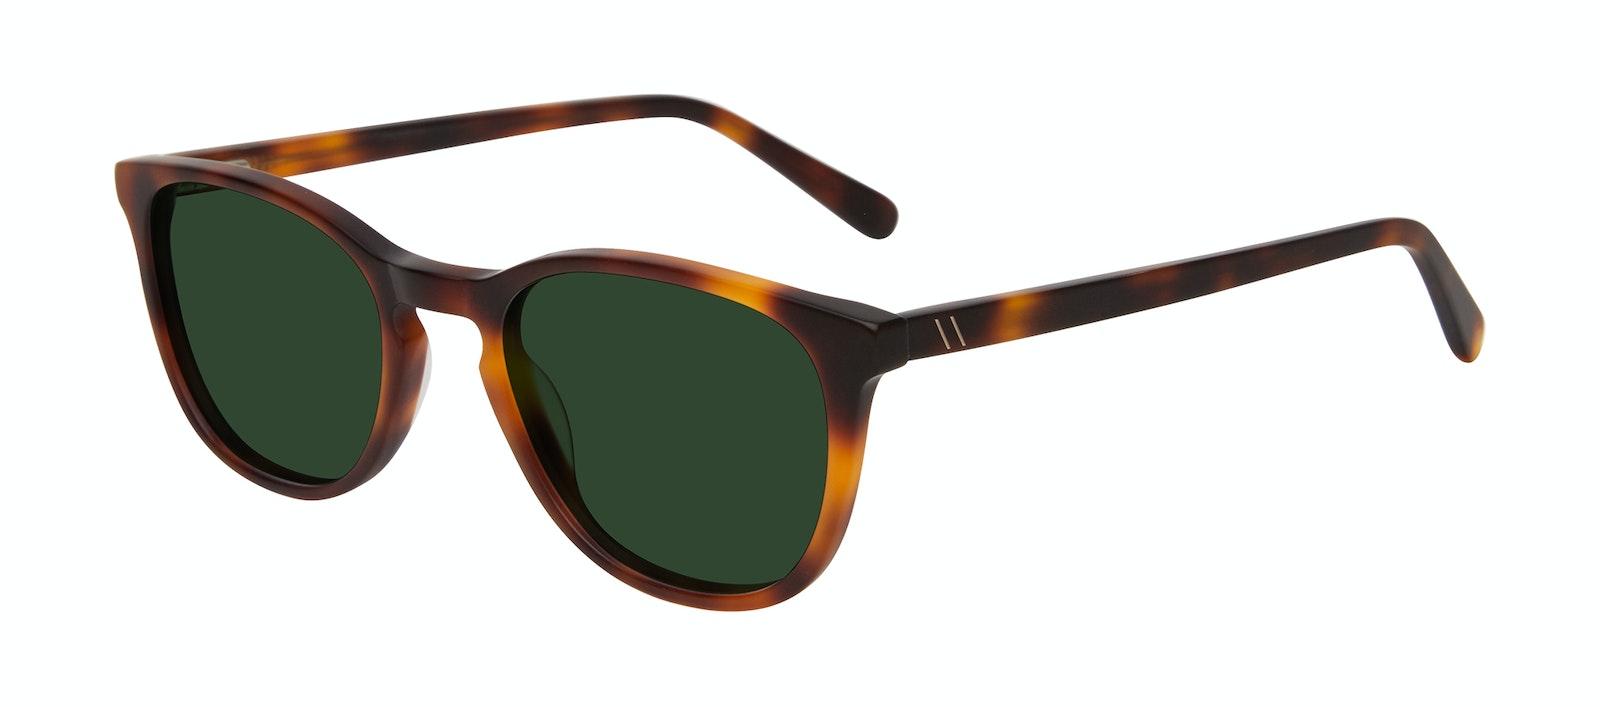 Affordable Fashion Glasses Square Sunglasses Men Swerve Matte Tortoise Tilt